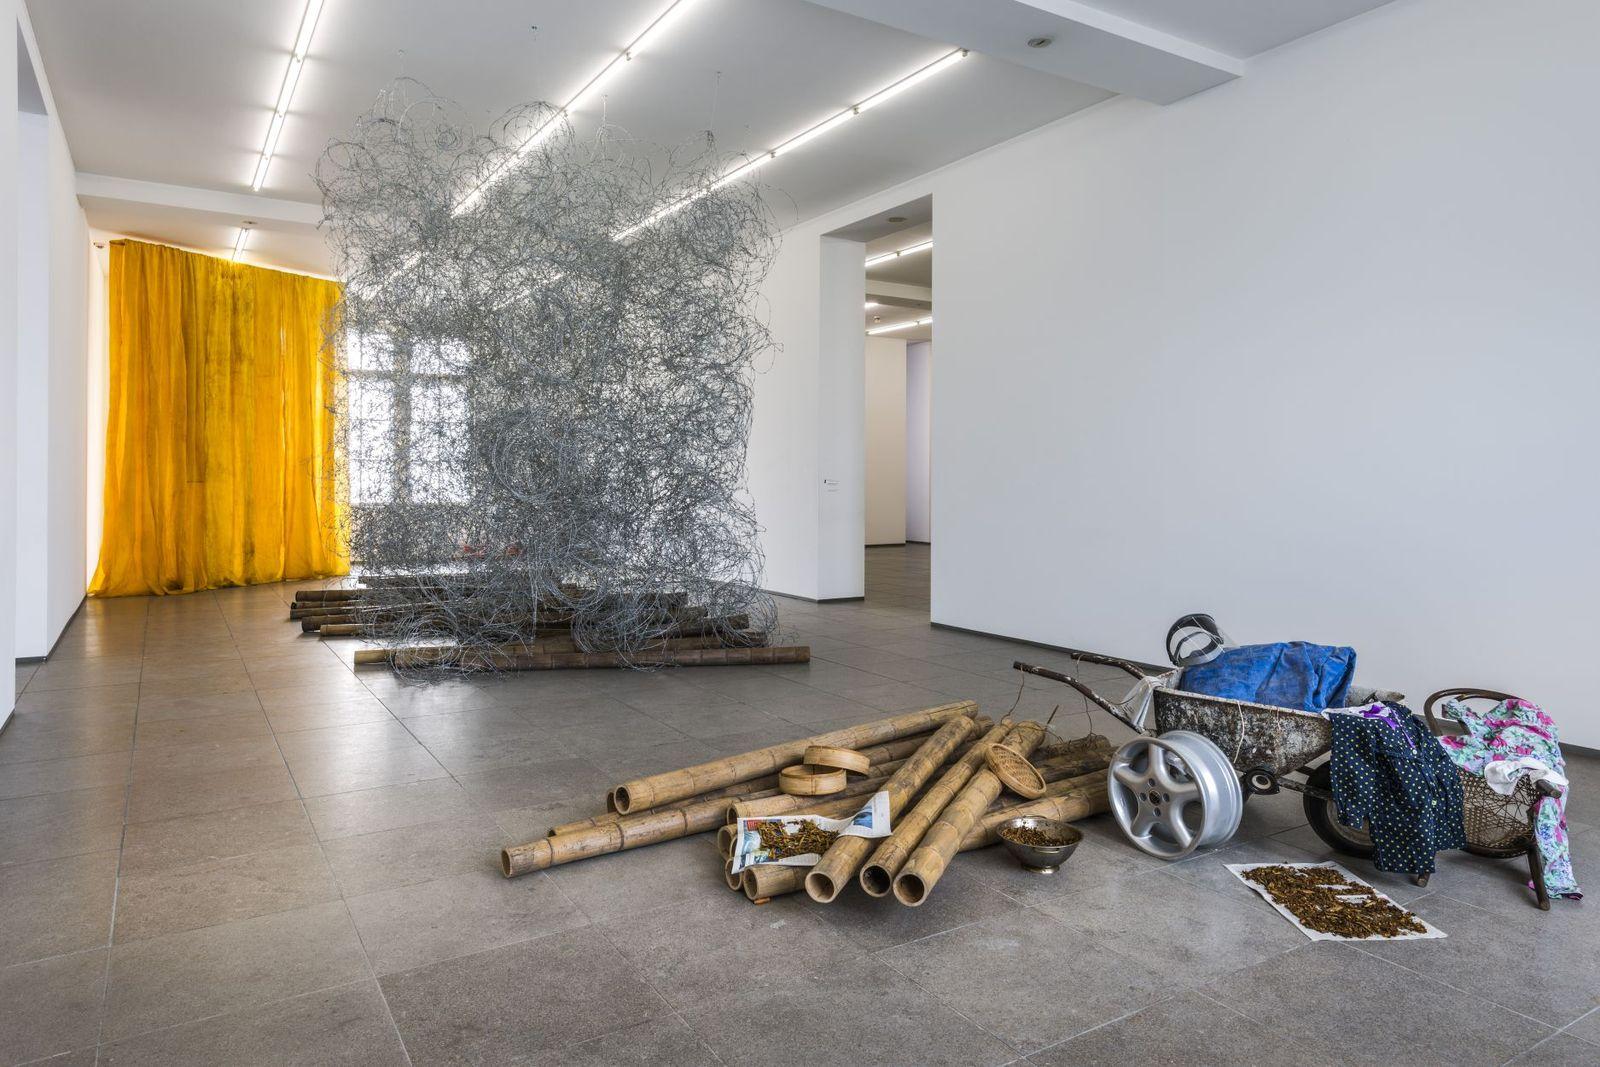 Qin Yufen: Making Paradise, 1996 – 2002  © Nationalgalerie im Hamburger Bahnhof, SMB, Eigentum des Landes Berlin / Jan Windszus VG Bild-Kunst Bonn, 2017